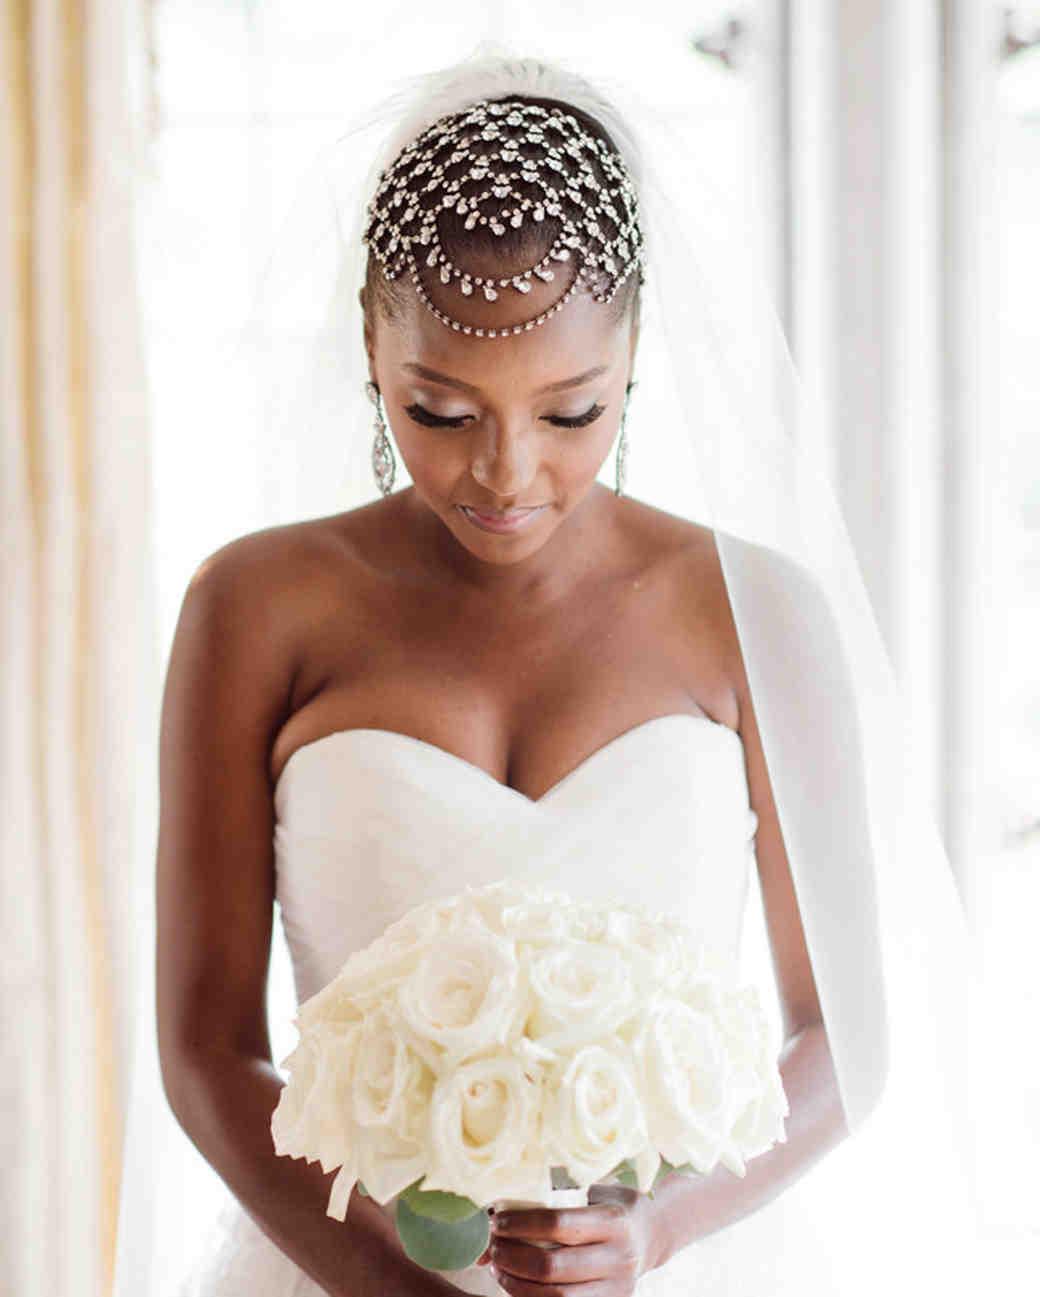 Bride Updo Hairstyles With Veil And Tiara Hrotelrehberii